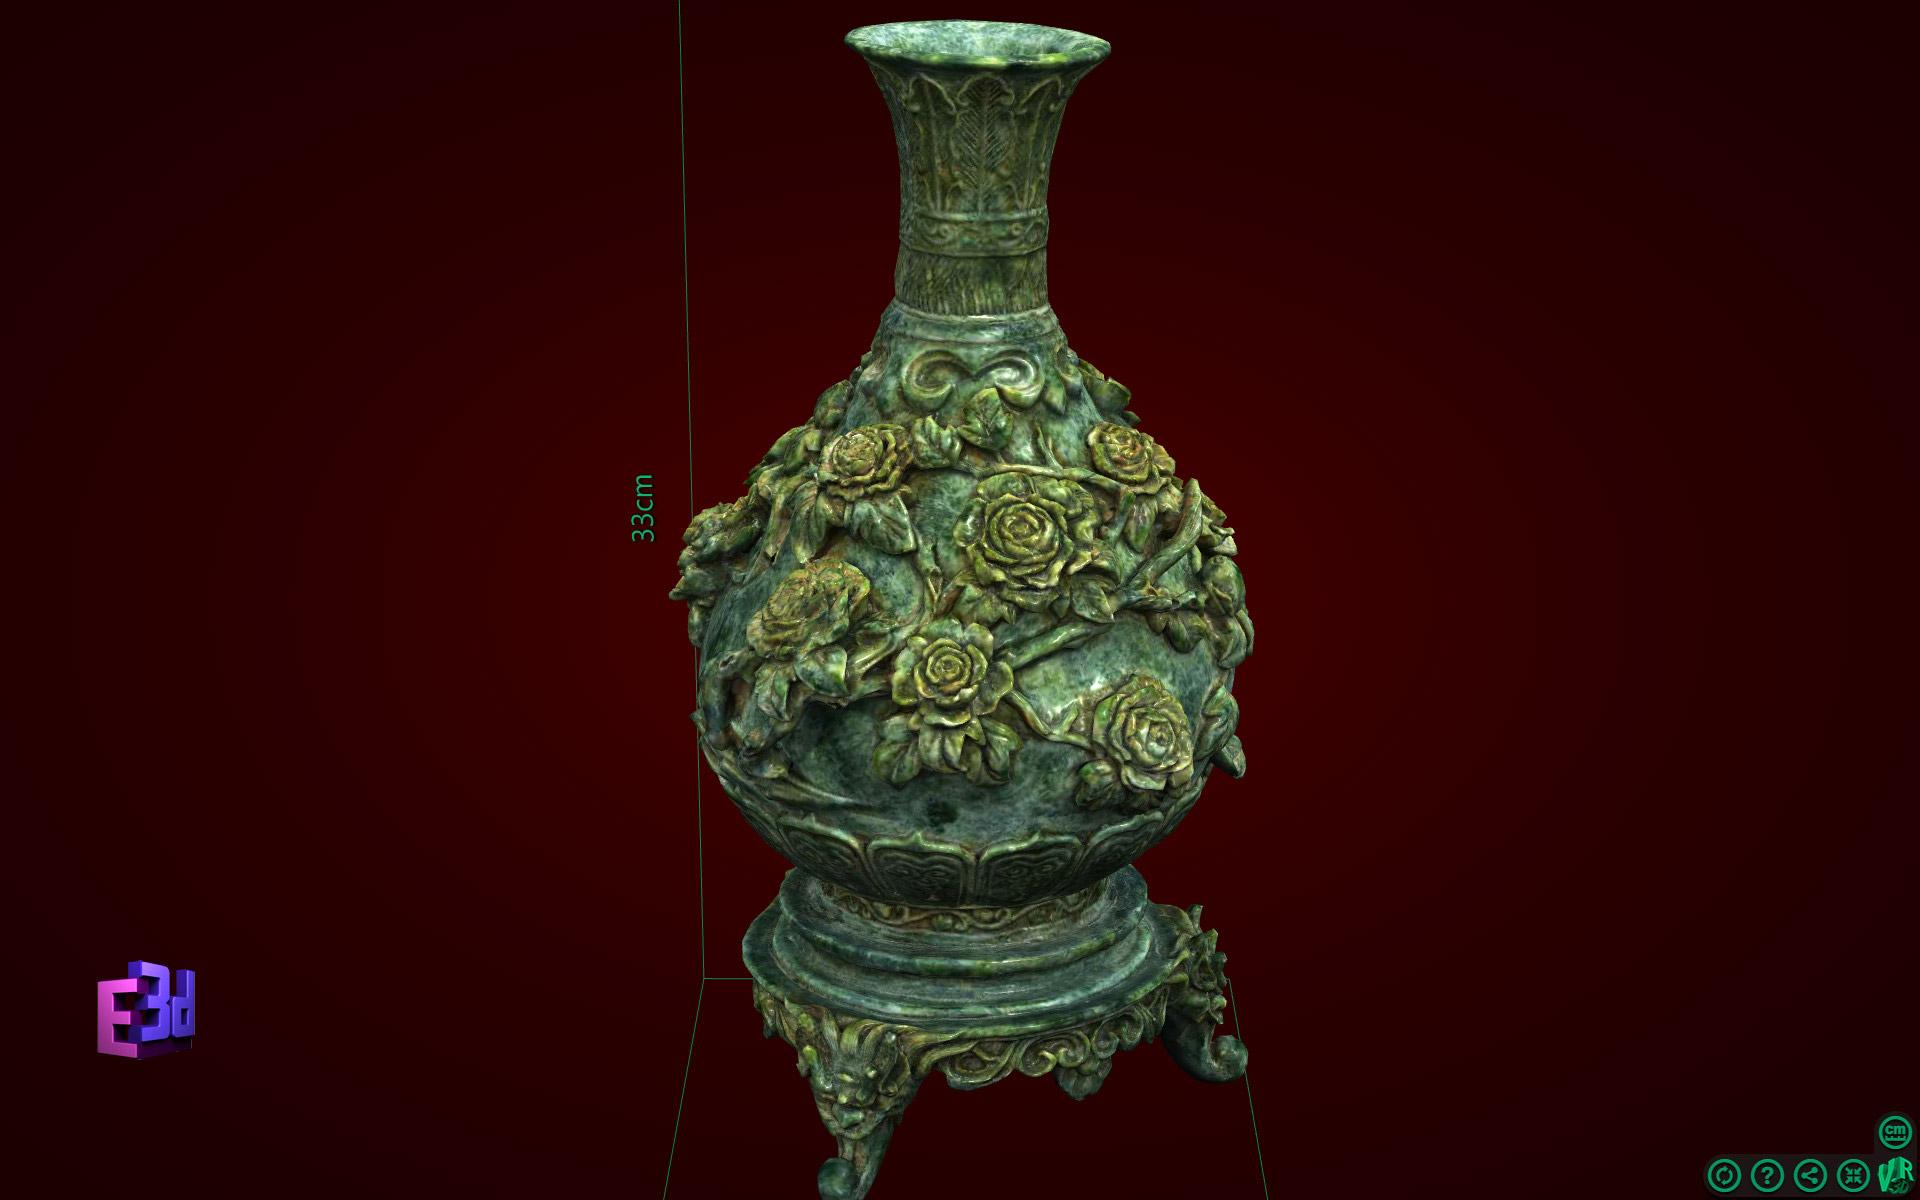 Lọ hoa phù dung